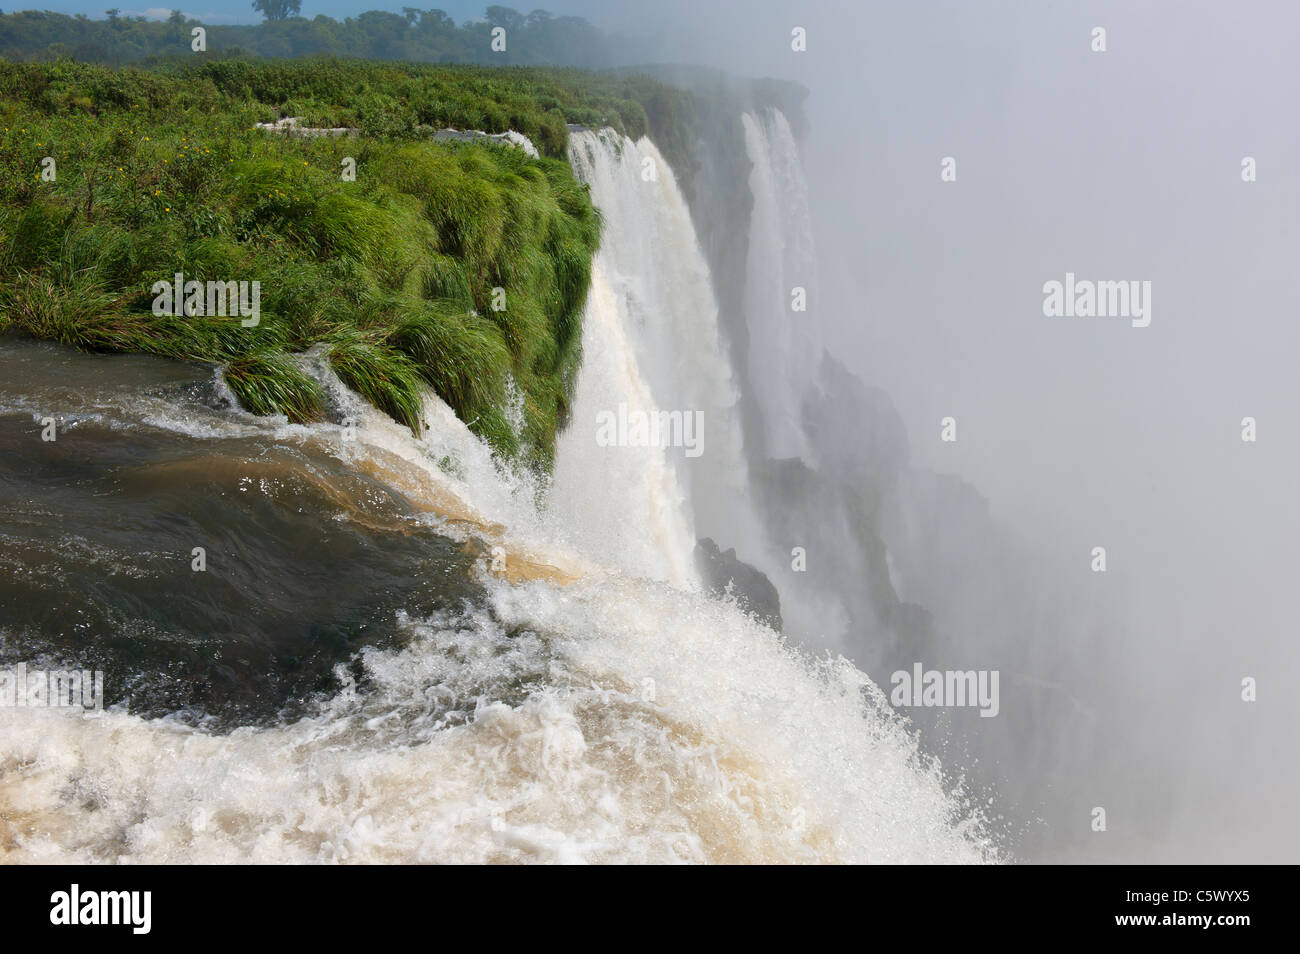 Iguazu/Iguaçu falls, Misiones Province, Argentina - Stock Image